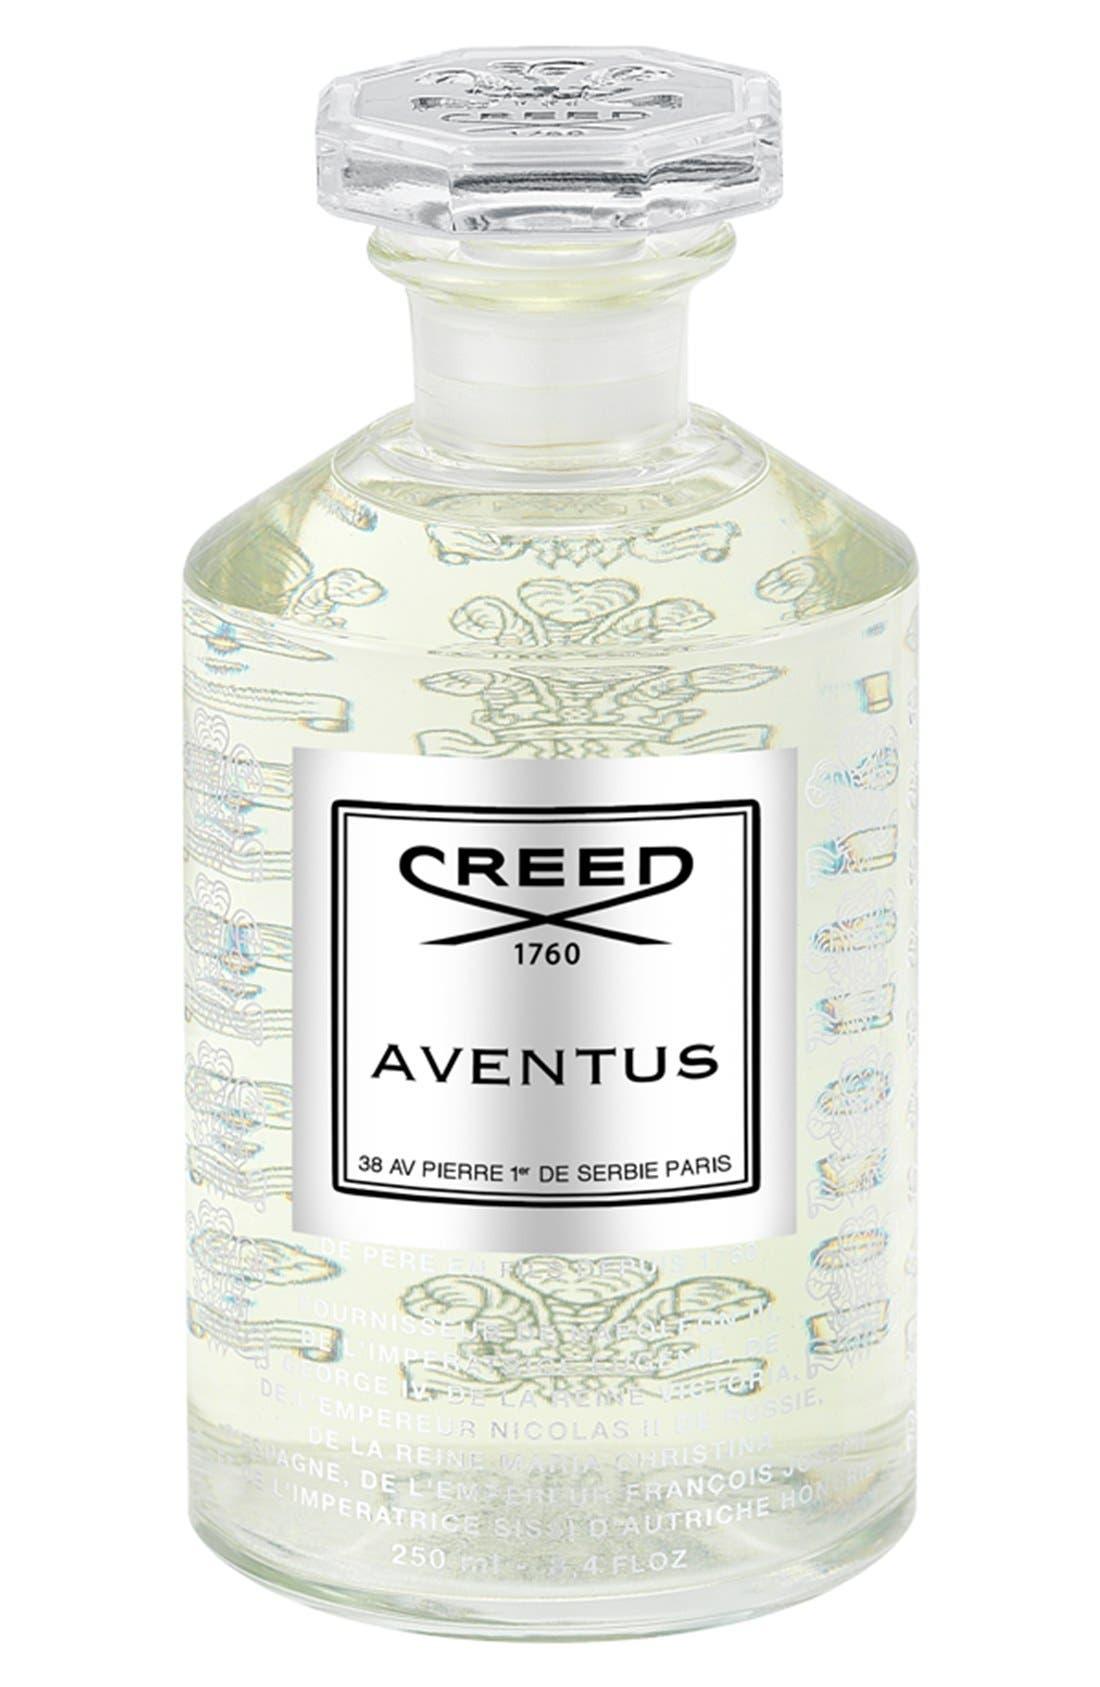 Creed 'Aventus' Fragrance (8.4 oz.)